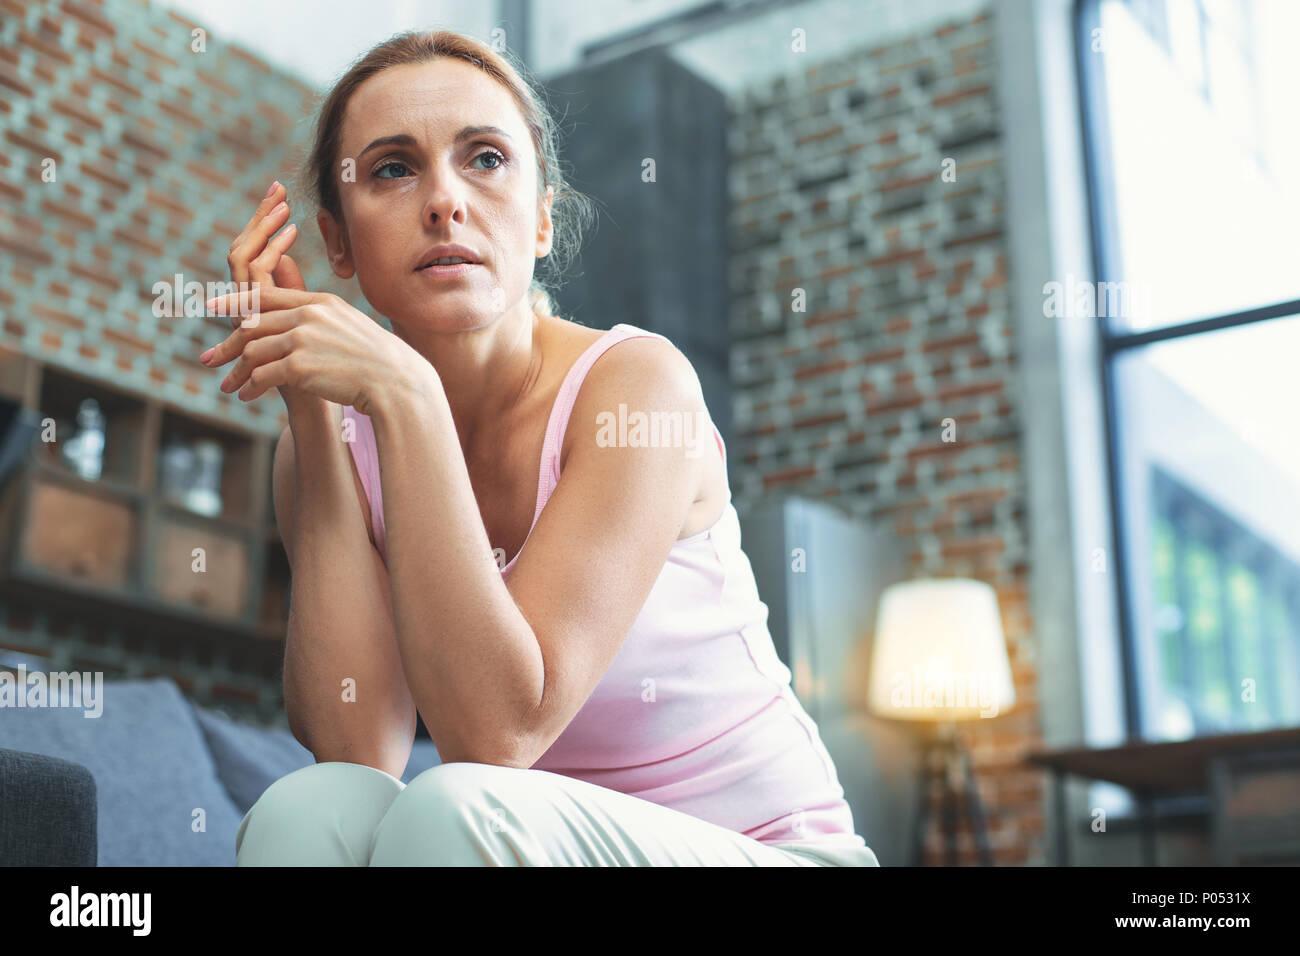 Mit reife Frau Hilflosigkeit erleben Stockbild